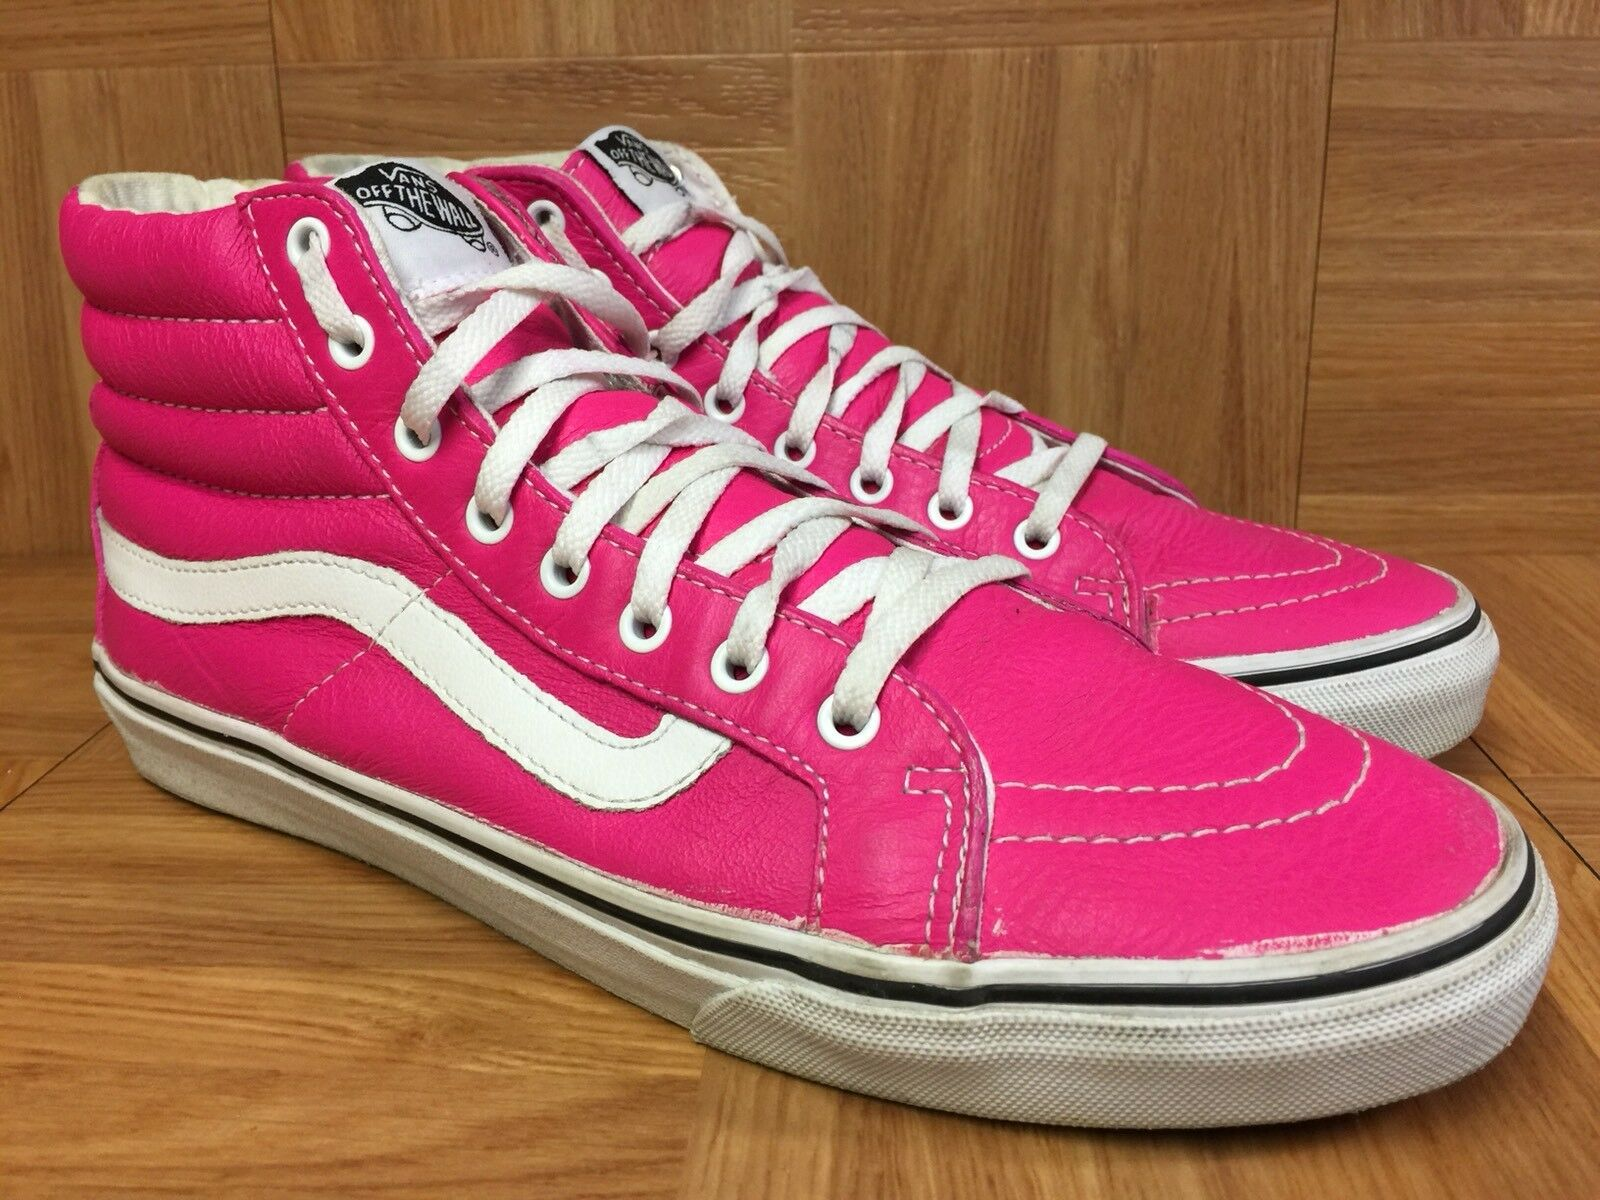 RARE VANS Sk8-Hi Iridescent Pink Leather shoes Sz 8 Men's - 9.5 Women's Cool